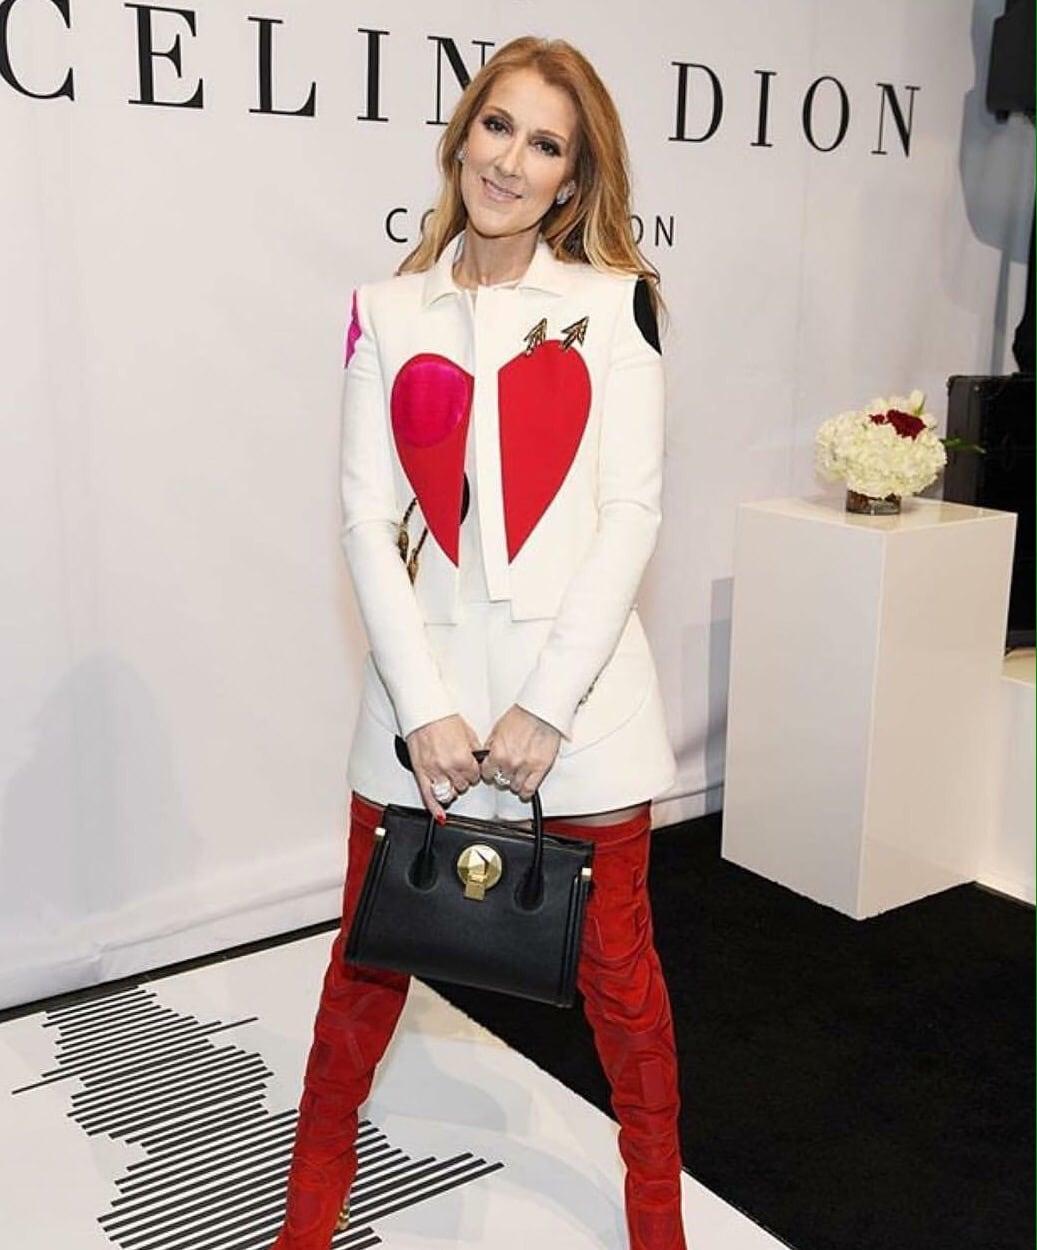 Schiaparelli for Céline Dion by Runway Magazine